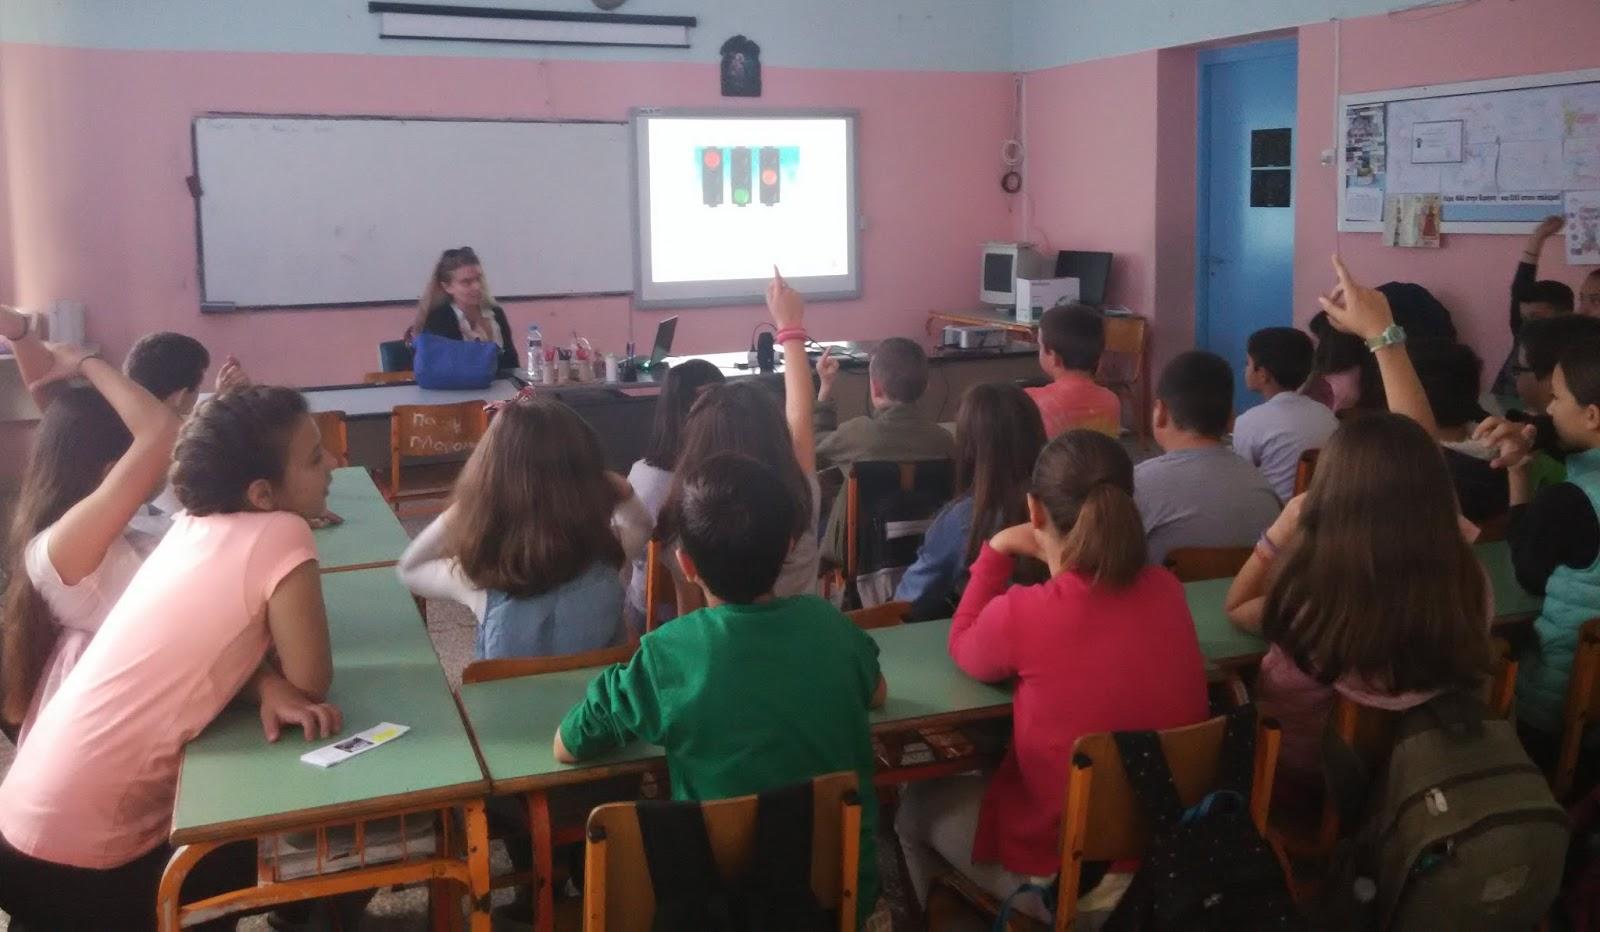 pella2 Σεμινάρια Κυκλοφοριακής Αγωγής σε χιλιάδες μαθητές σχολείων κυκλοφοριακή αγωγή, σχολείο